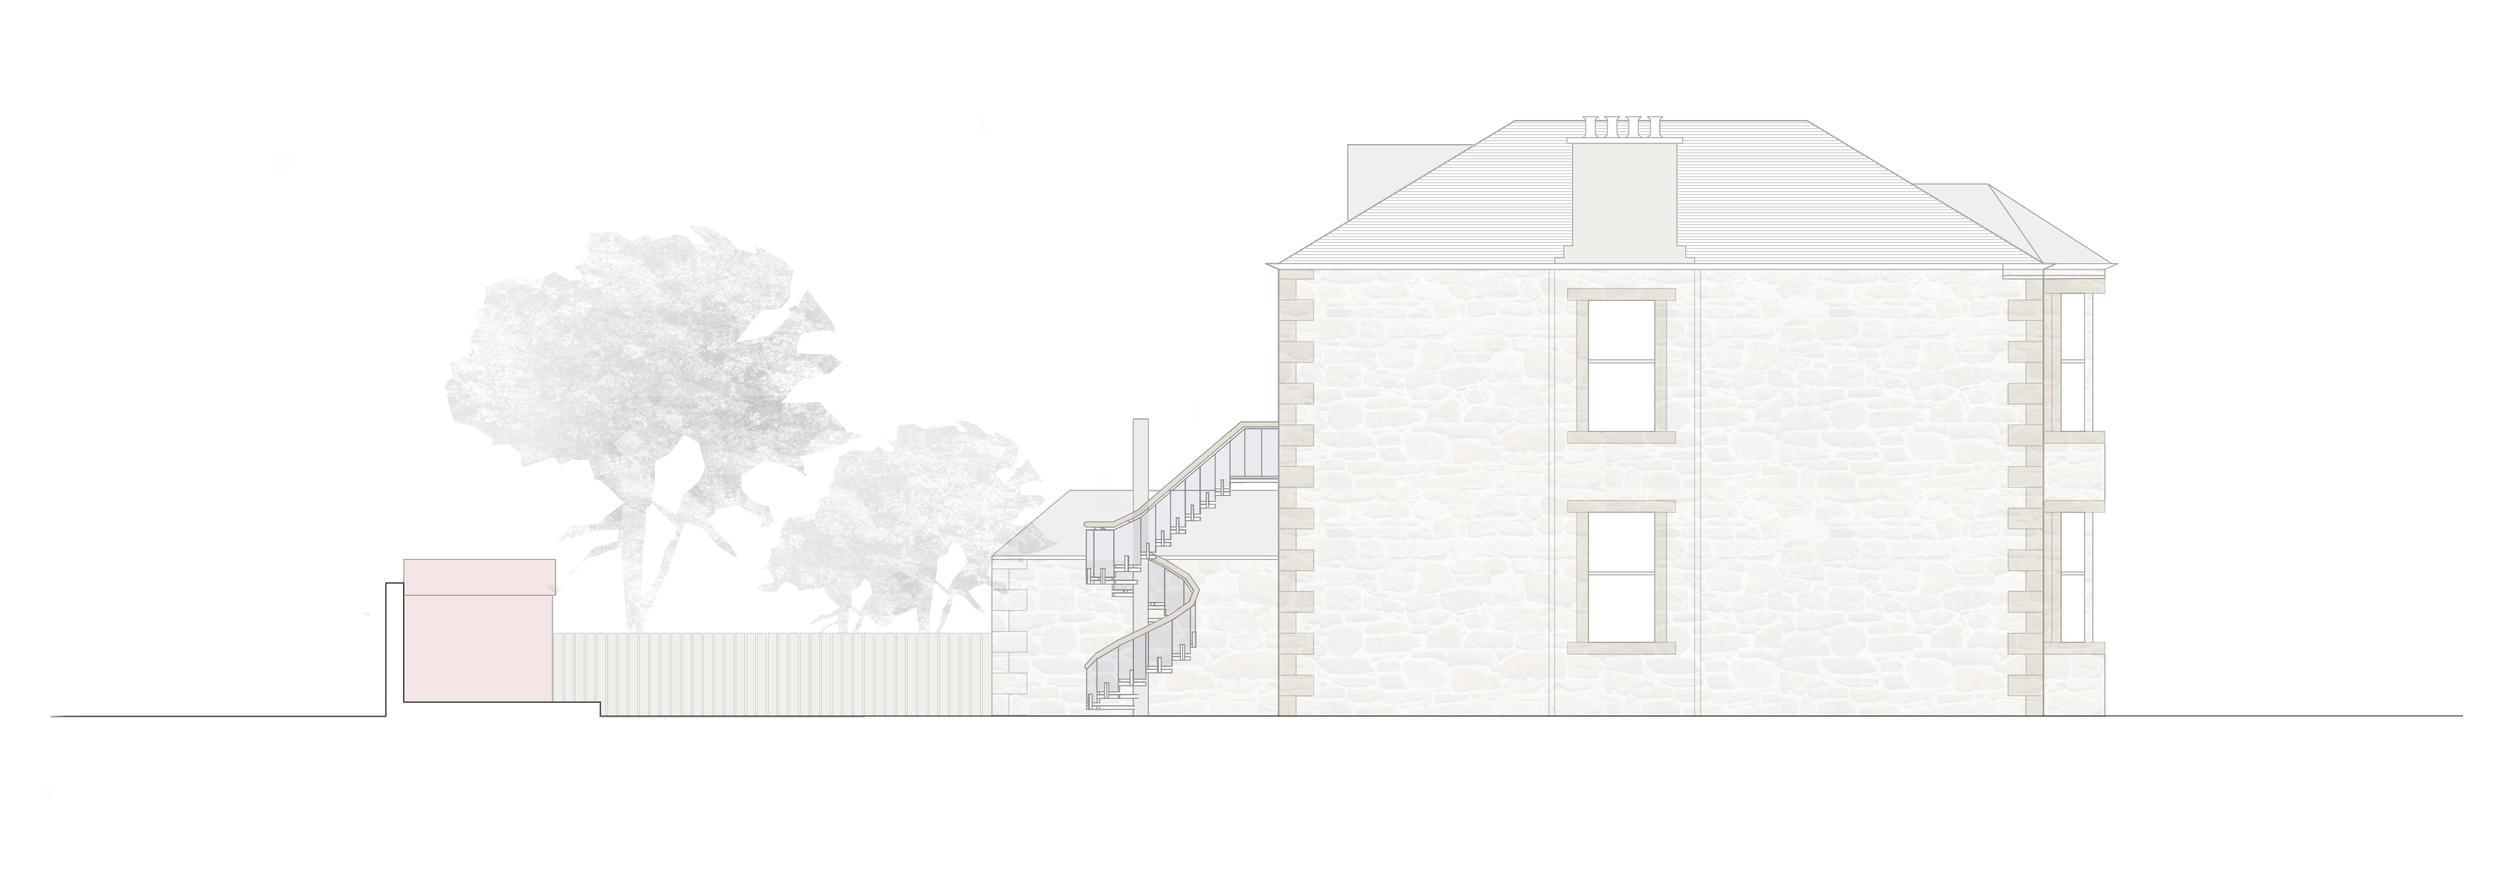 Side Elevation.jpg